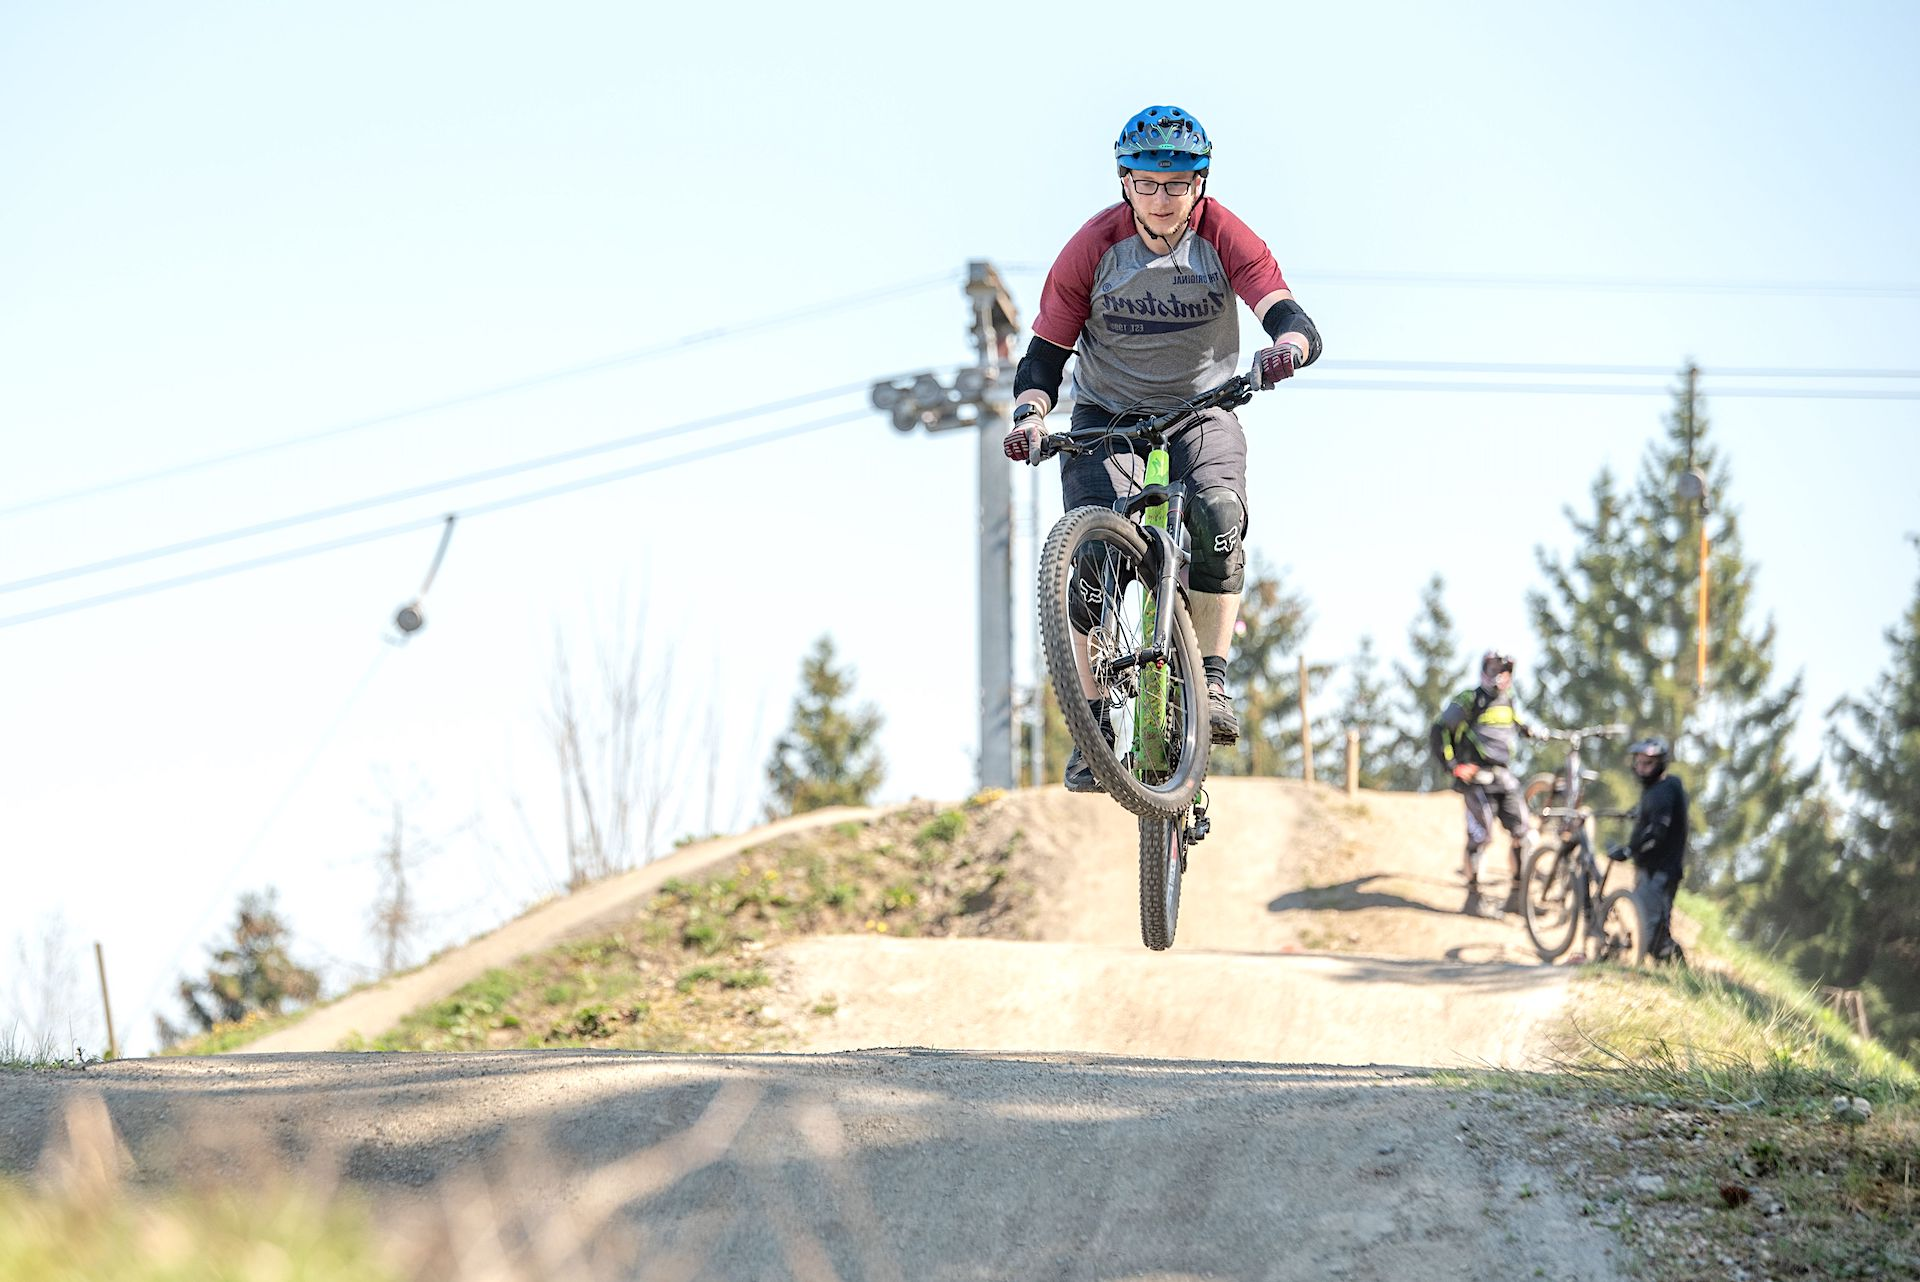 MTB Fahrtechnik Kurse im Trailpark Erbeskopf Hunsrück Sprung Kurse Training Rock my Trail Bikeschule